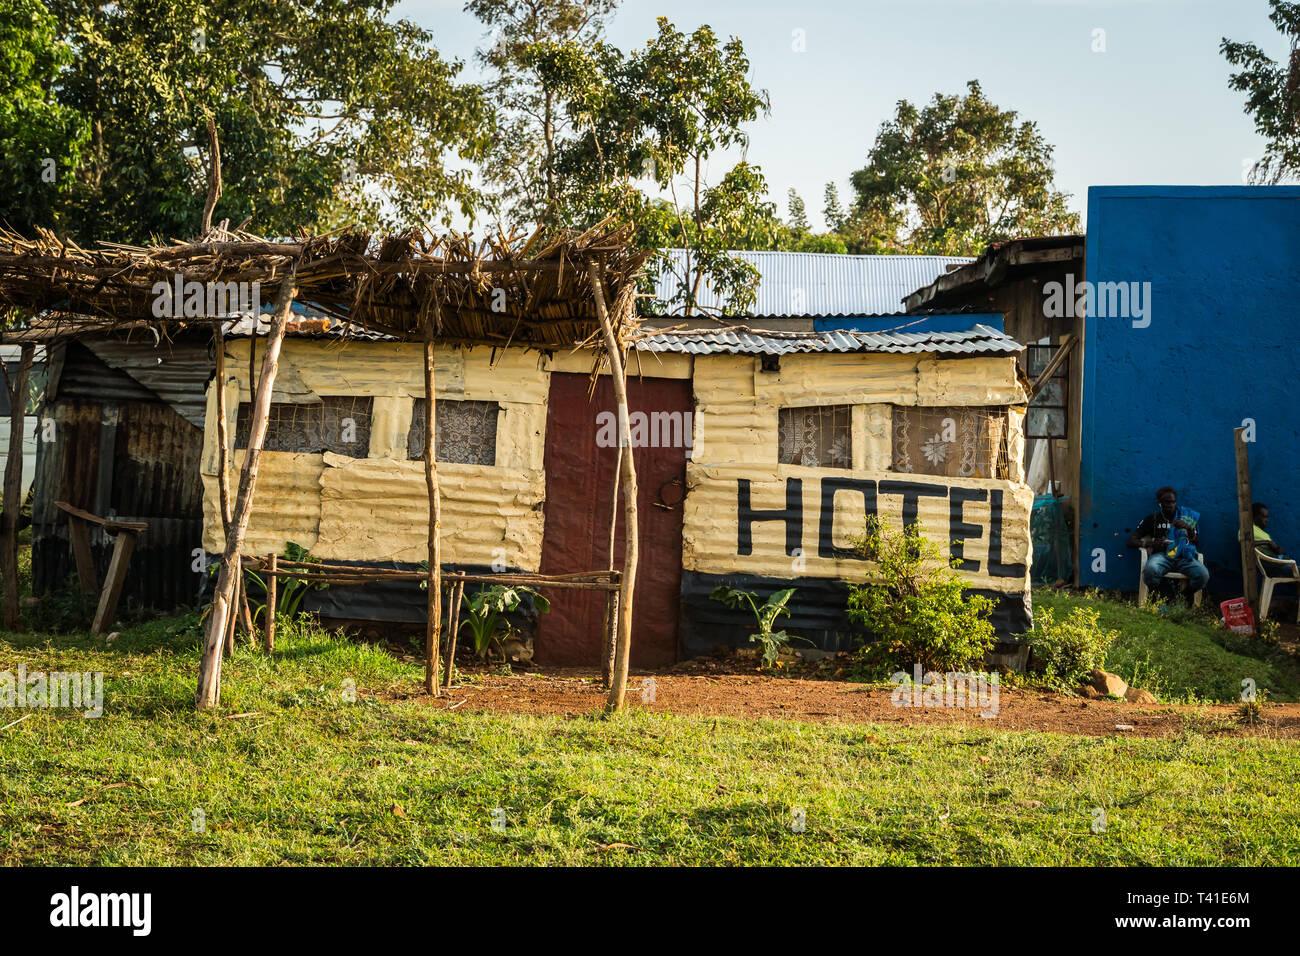 Near Kisumu Kenya March 8 2019 A Local Hotel In The